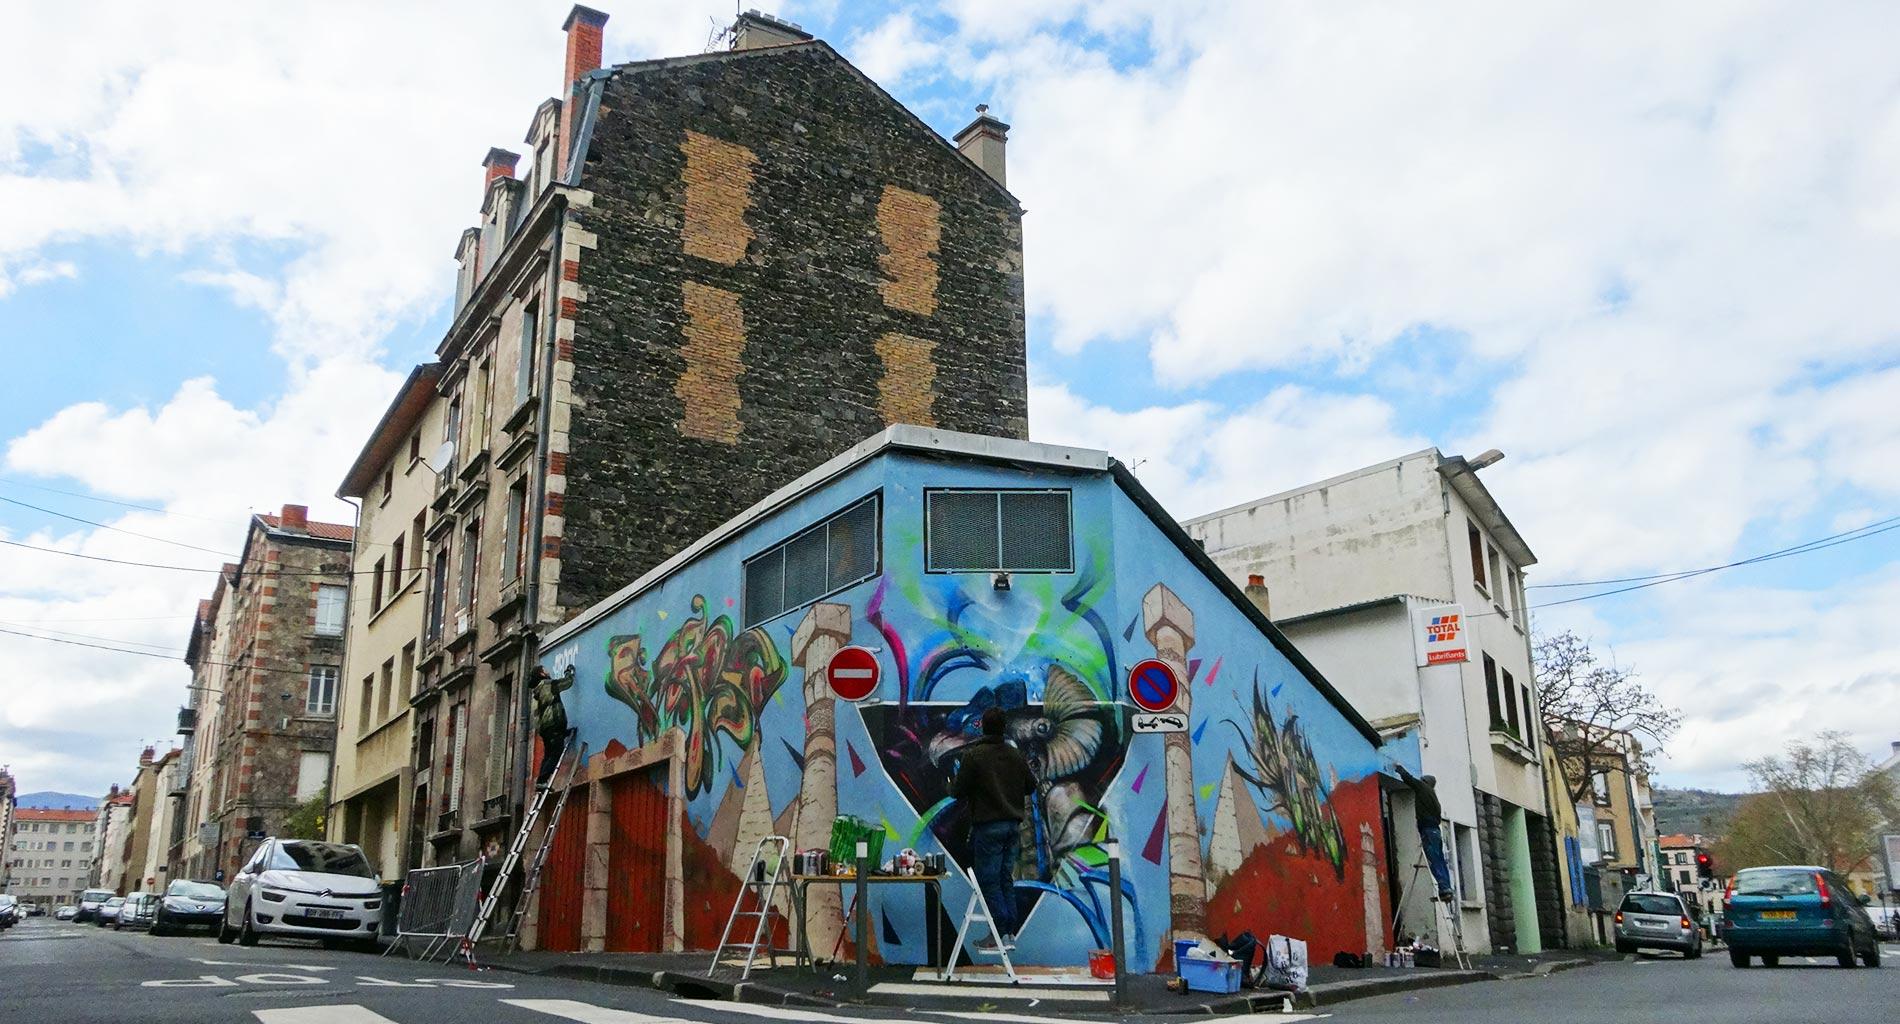 Fresque Pyramide - Graffiti - Clermont-Ferrand